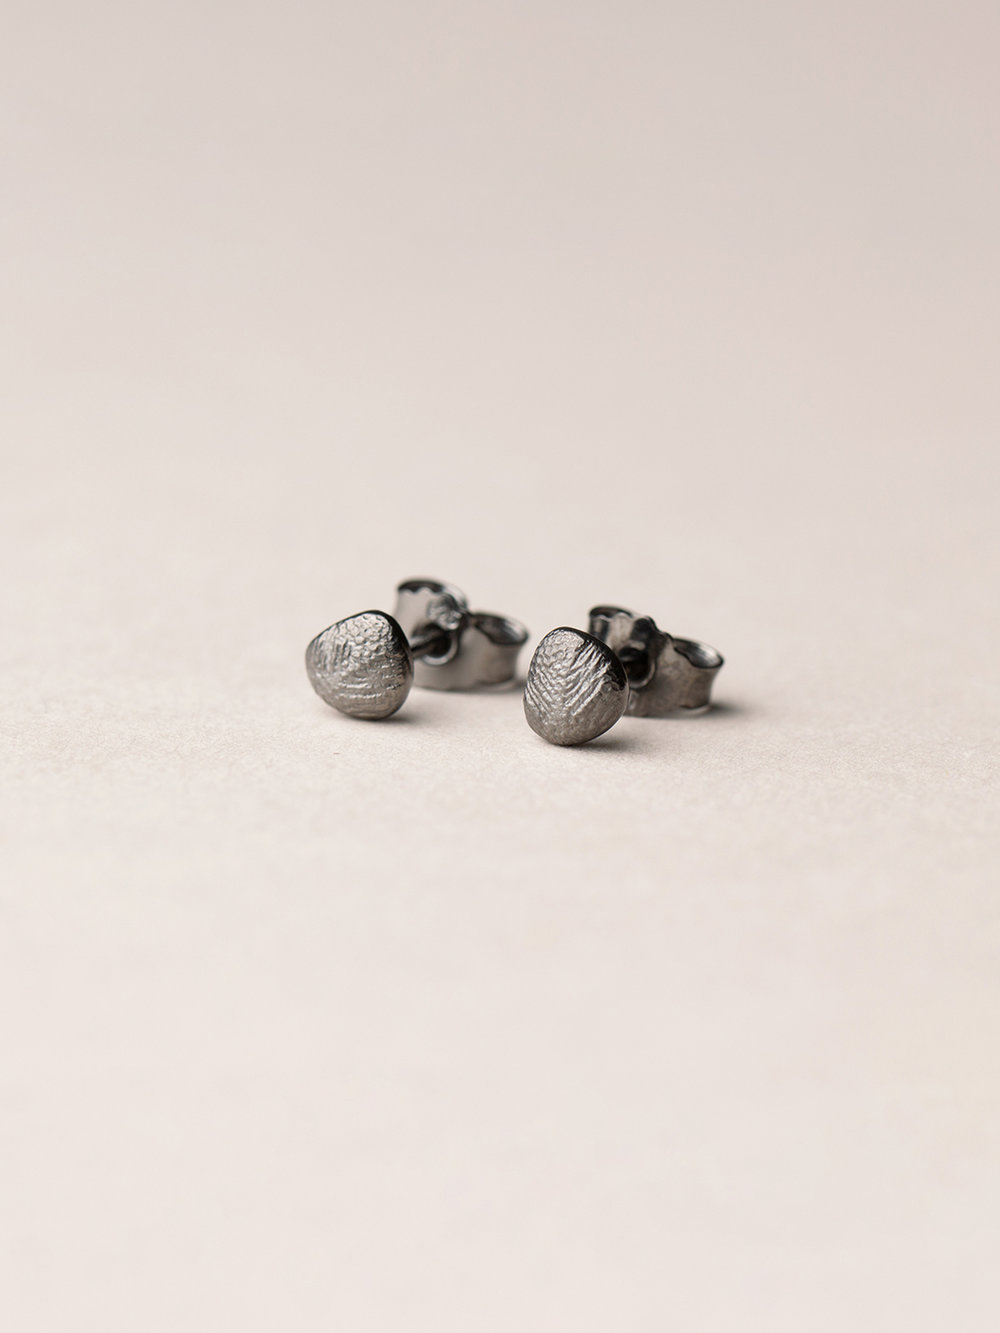 Runde Amia-Ohrstecker in schwarzrutheniertem Silber  Amia, stud earrings in blackruthenized silver